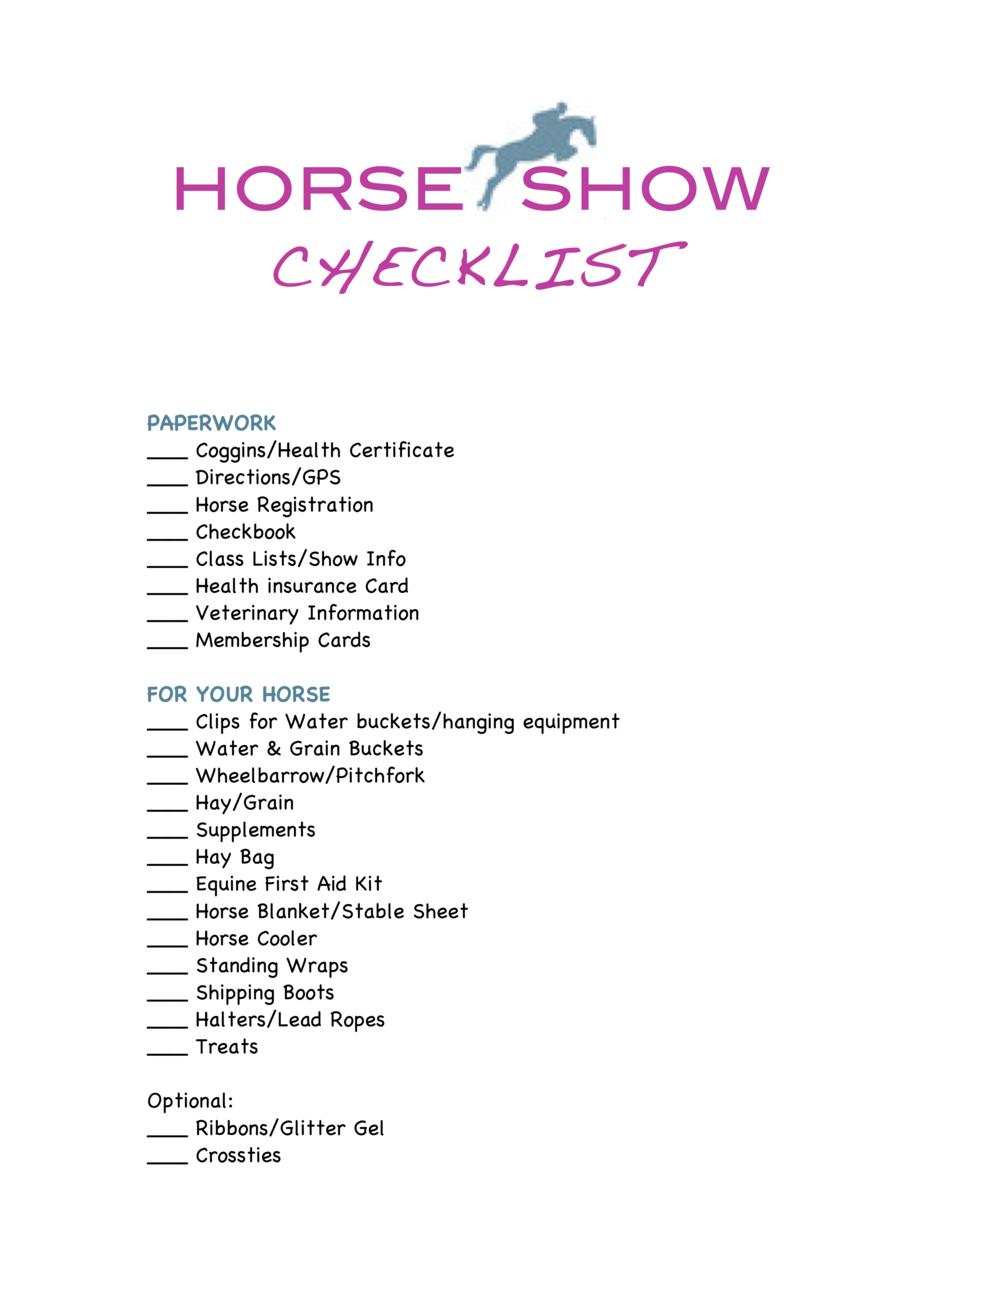 HORSE+SHOW+CHECKLIST 2 copy.png